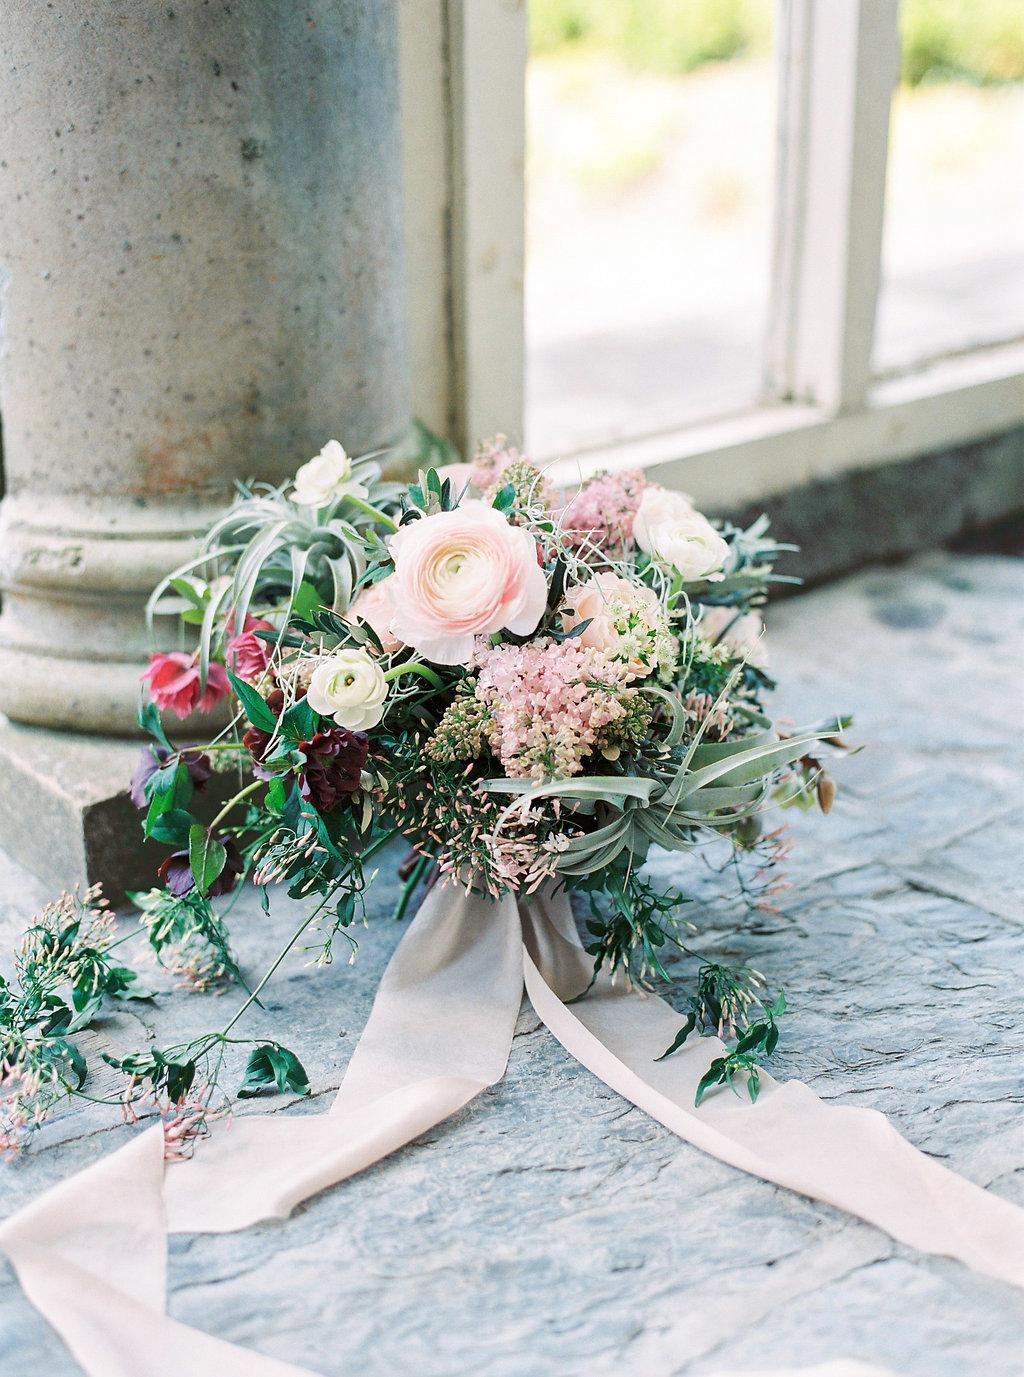 WeddingSparrow-PhotographybyIntoTheLight-Macias-lordan.com-ONLINESHARING(9of50).jpg